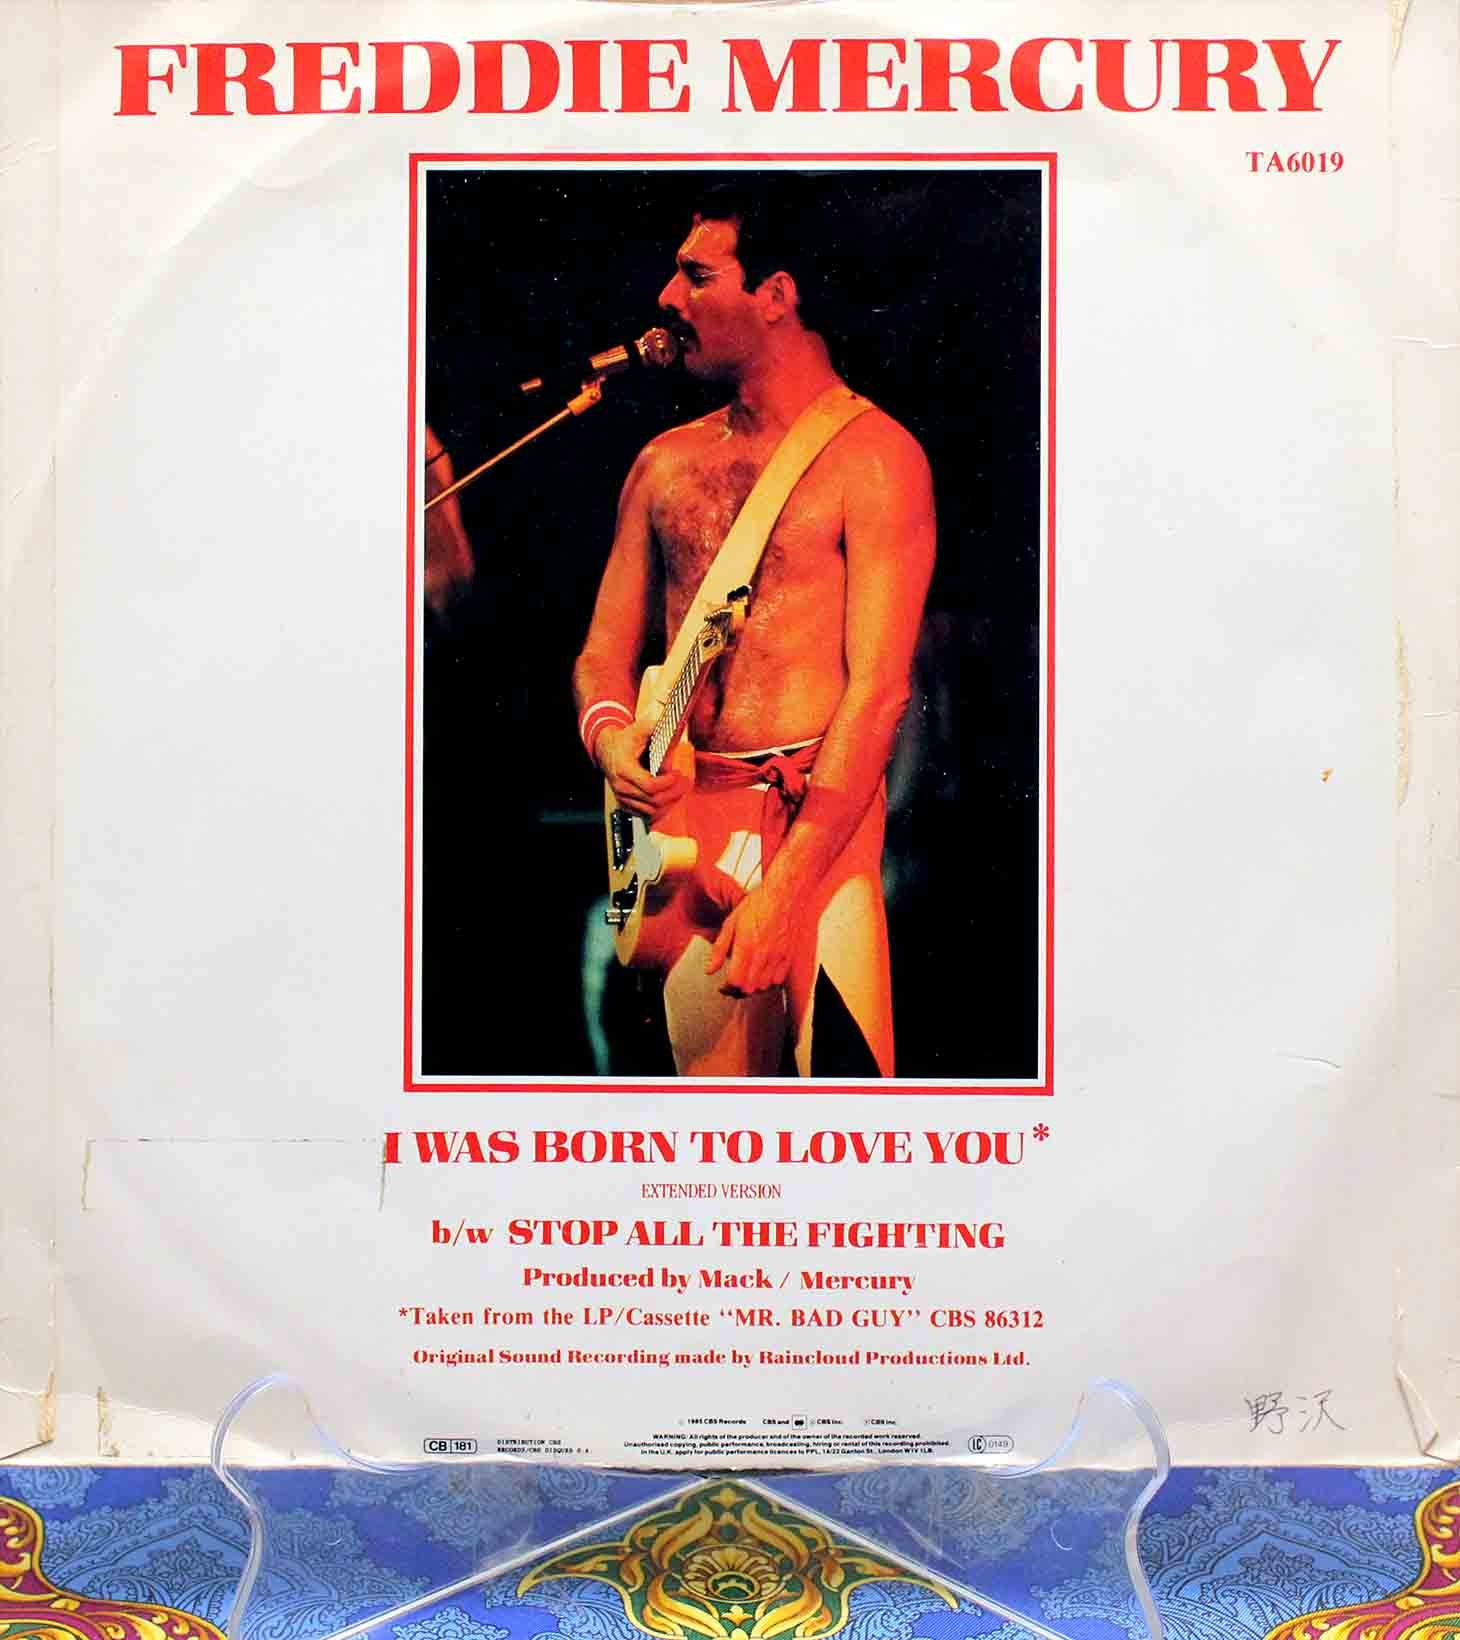 Freddie Mercury – I Was Born To Love You 02